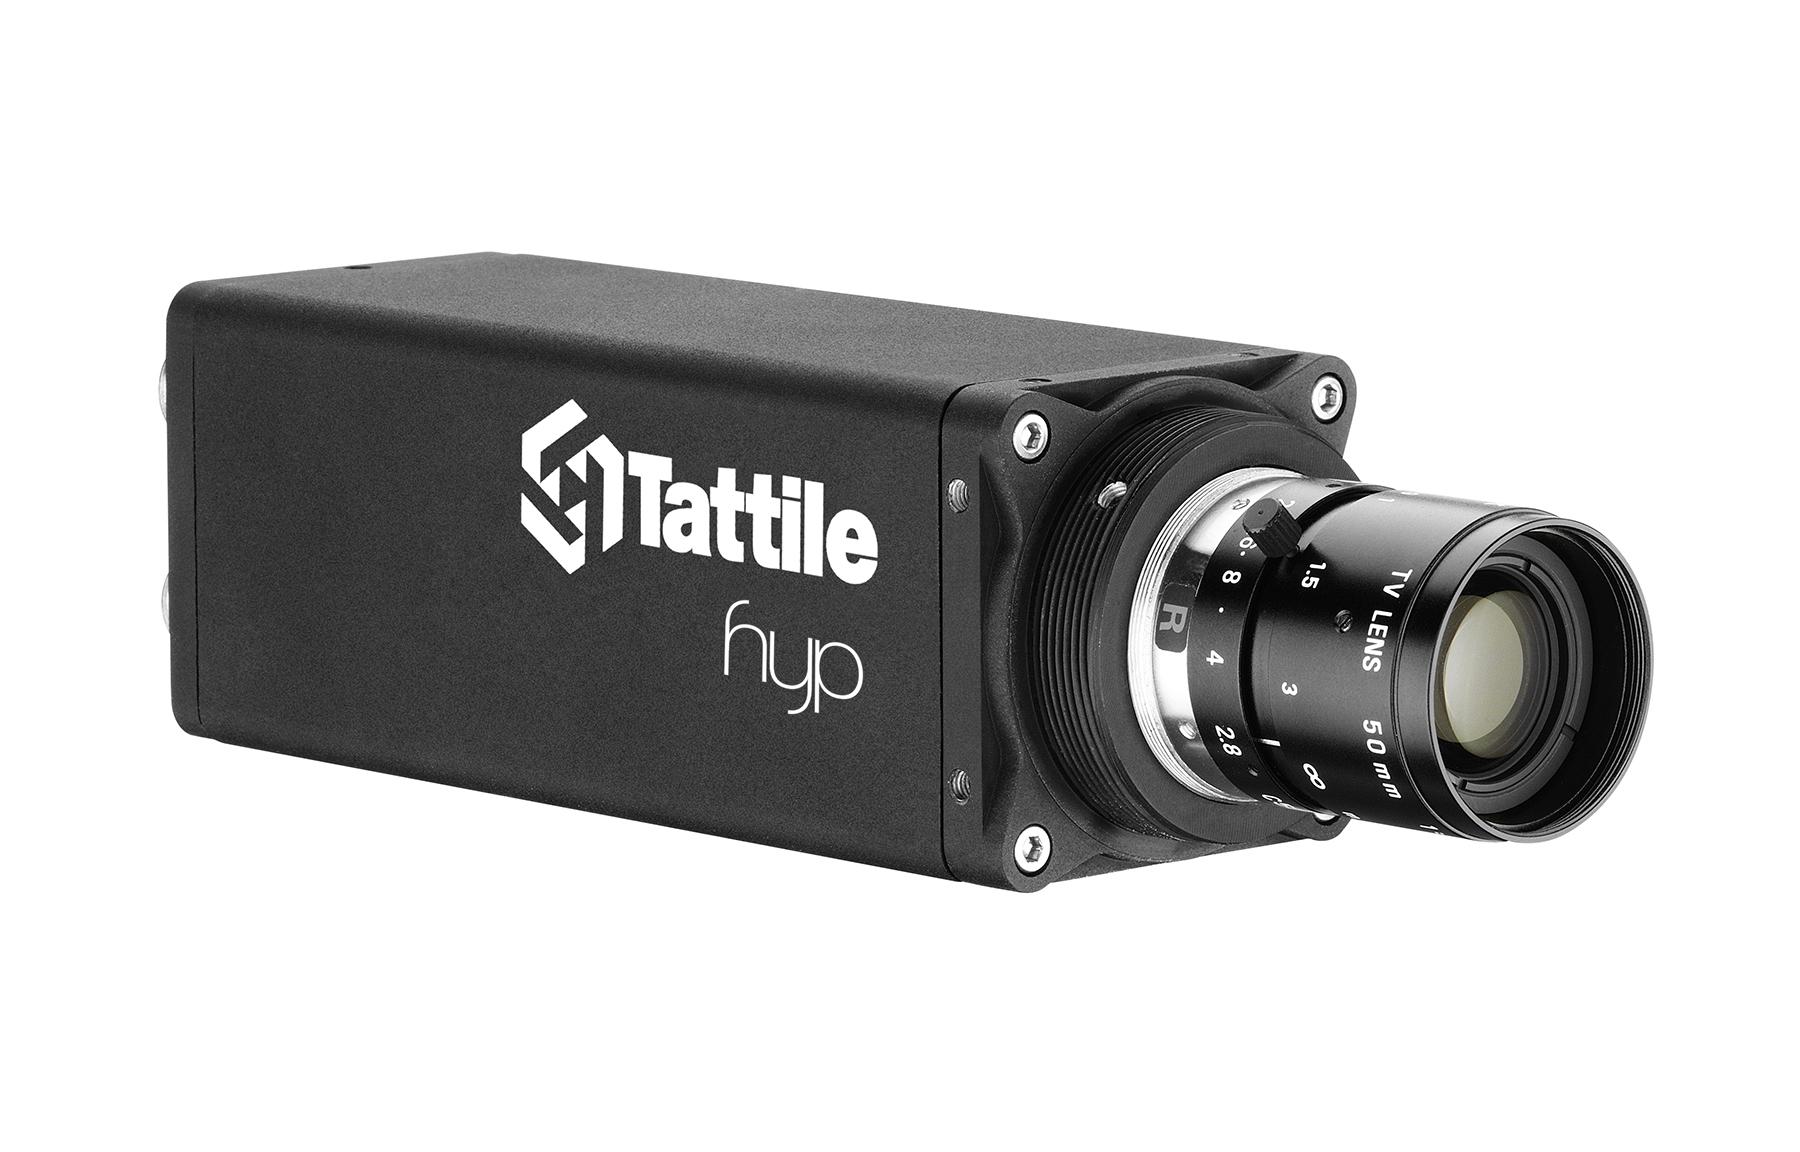 Tattile's hyperspektrale Smart-Kamera 'S200'bringt Höchstleistung direkt ans Band